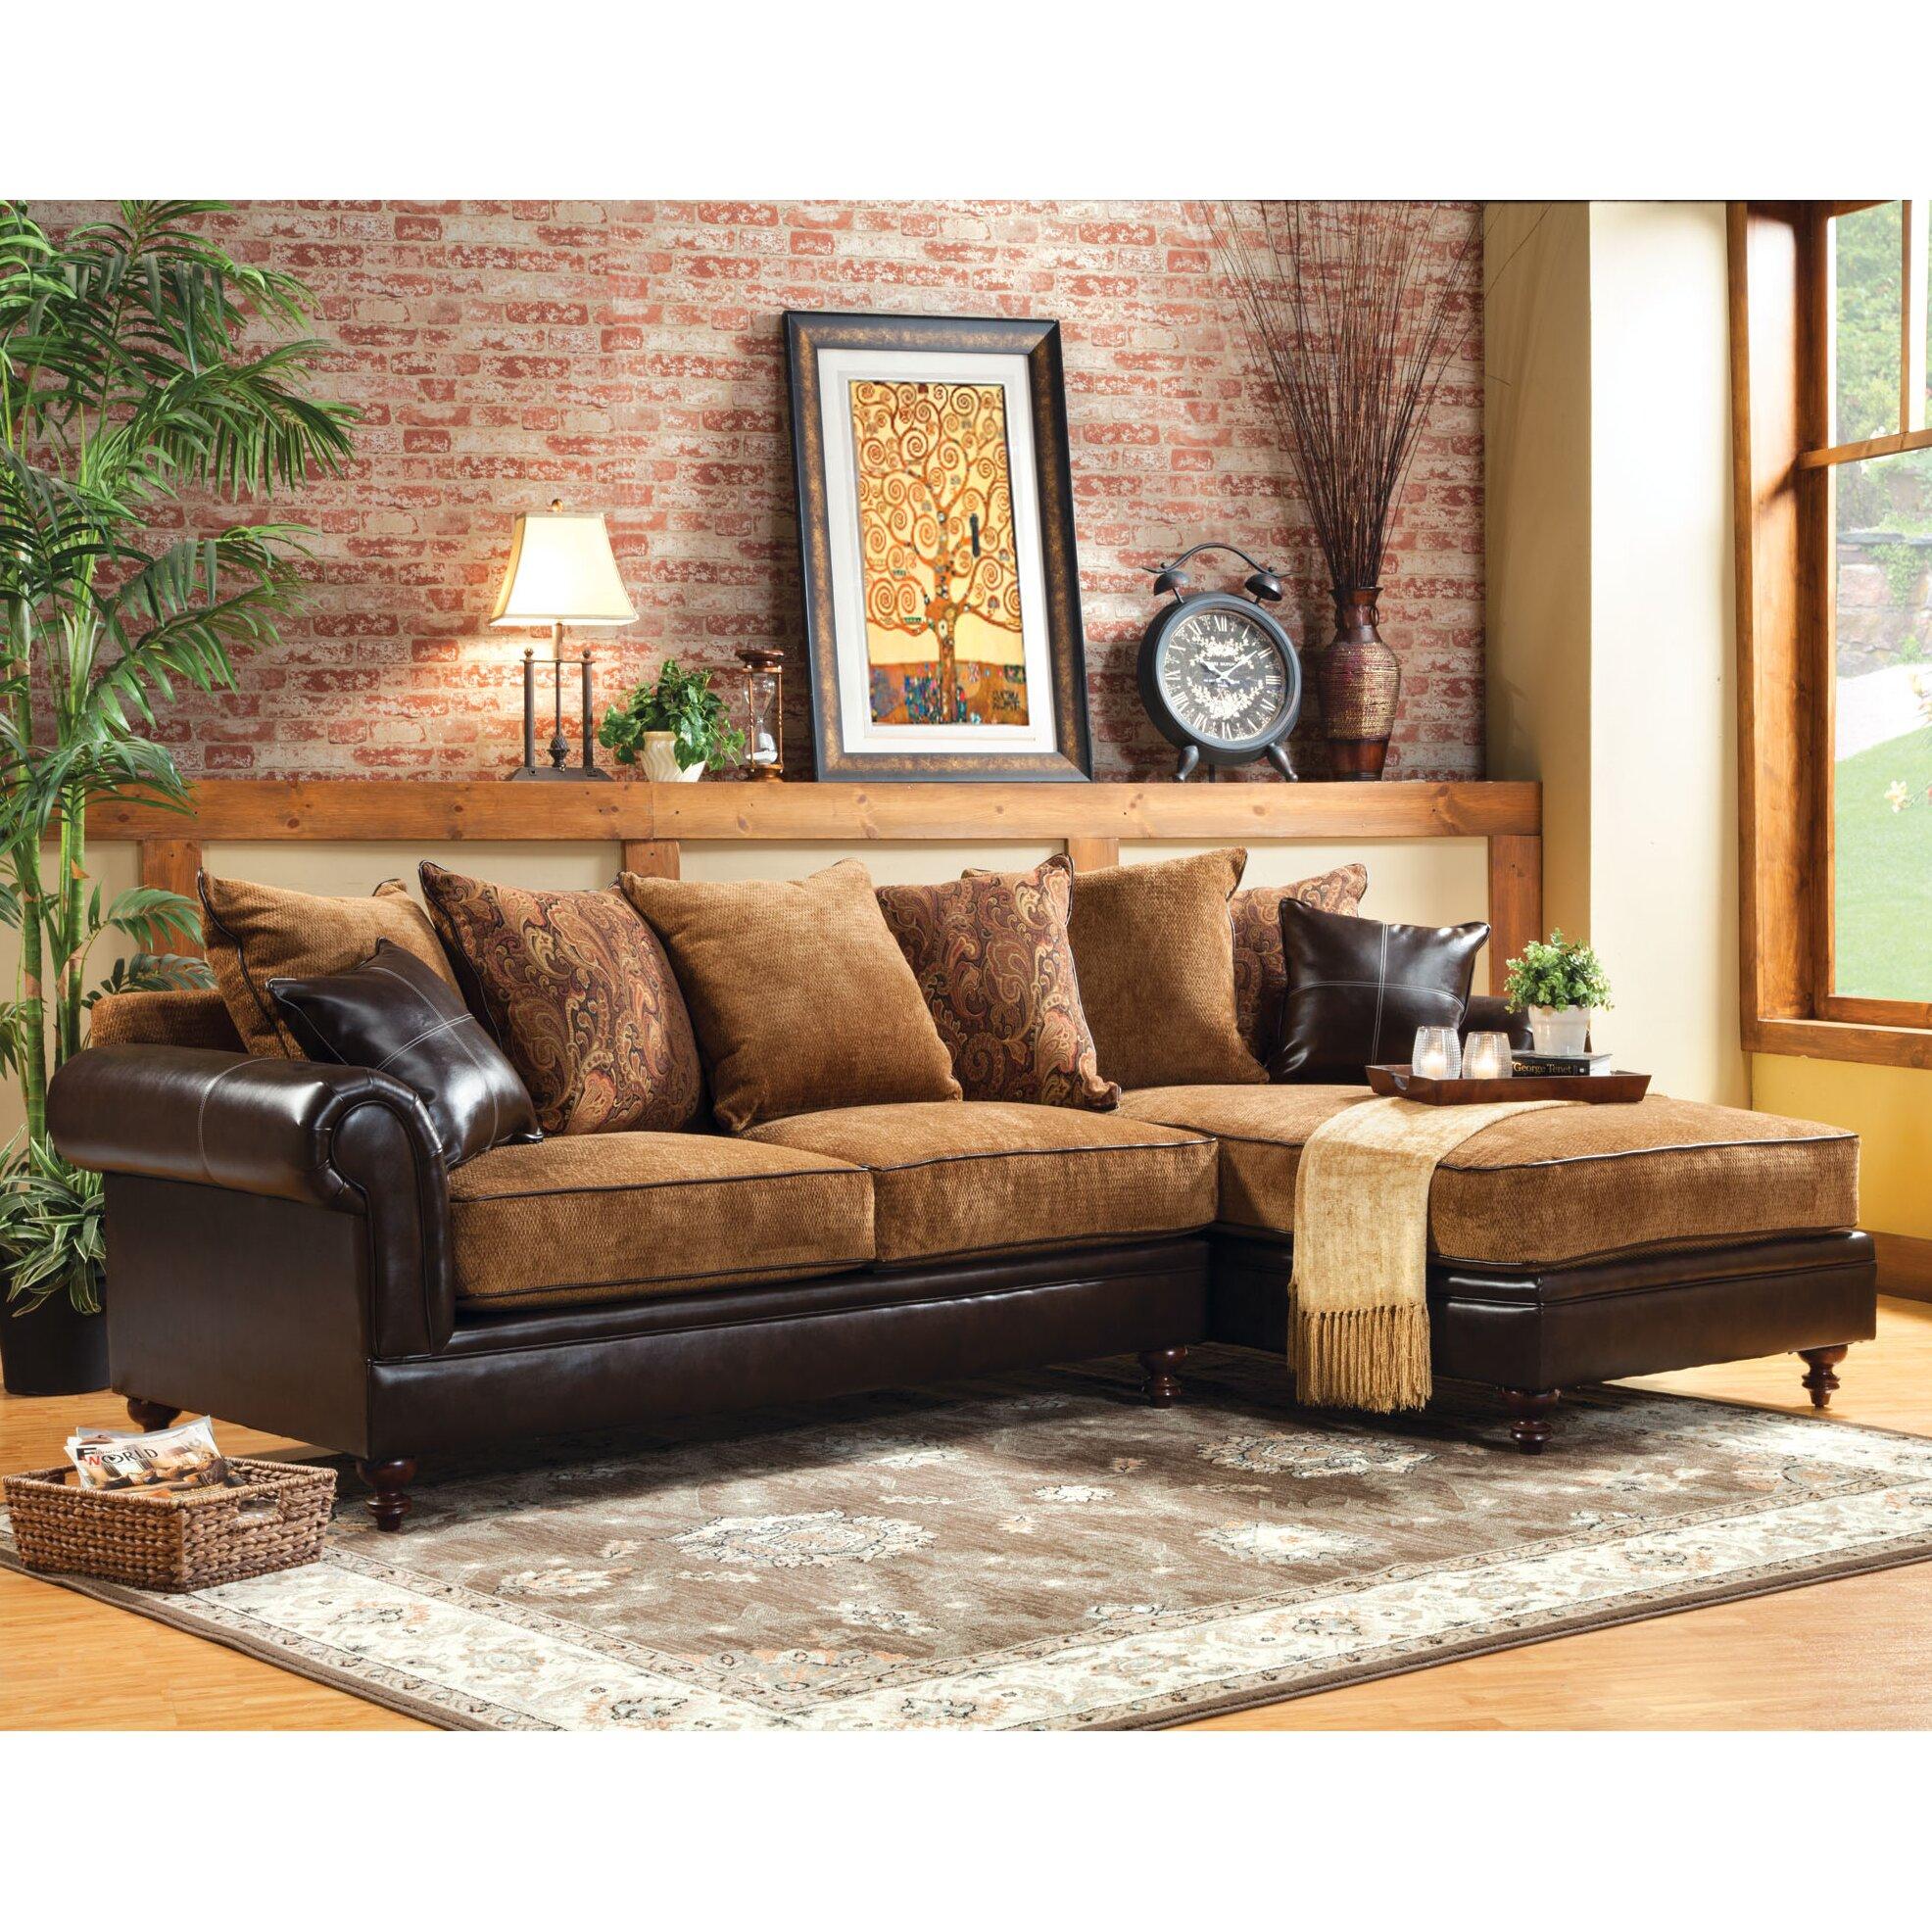 Hokku designs gastonne sectional reviews wayfair for Hokku designs living room furniture